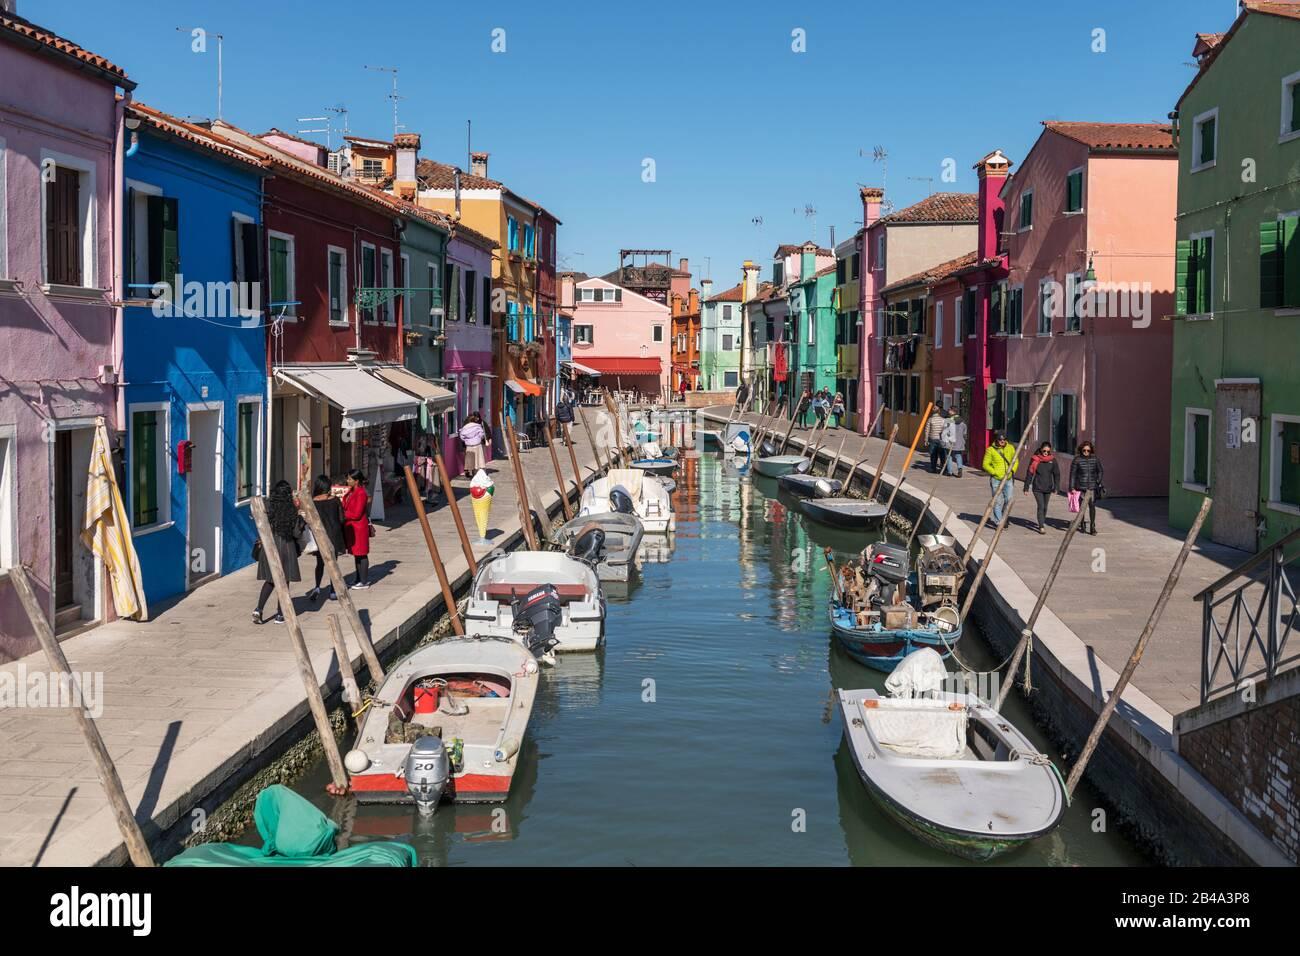 Burano, Venice, February 25th - March 3rd. 2020: Stock Photo